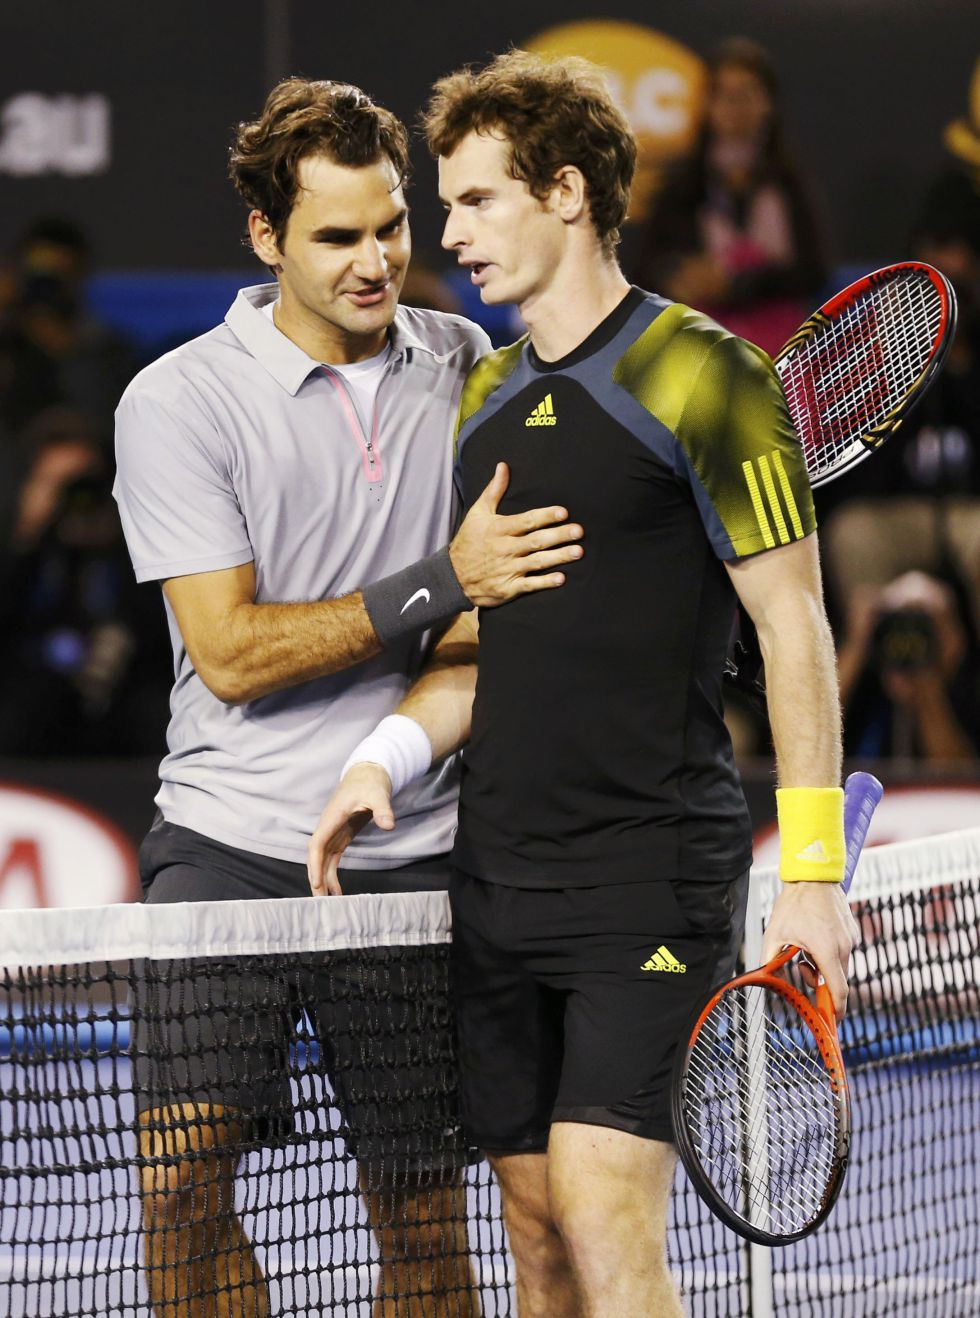 Final Andy Murray vs Novak Djokovic, como en el US Open